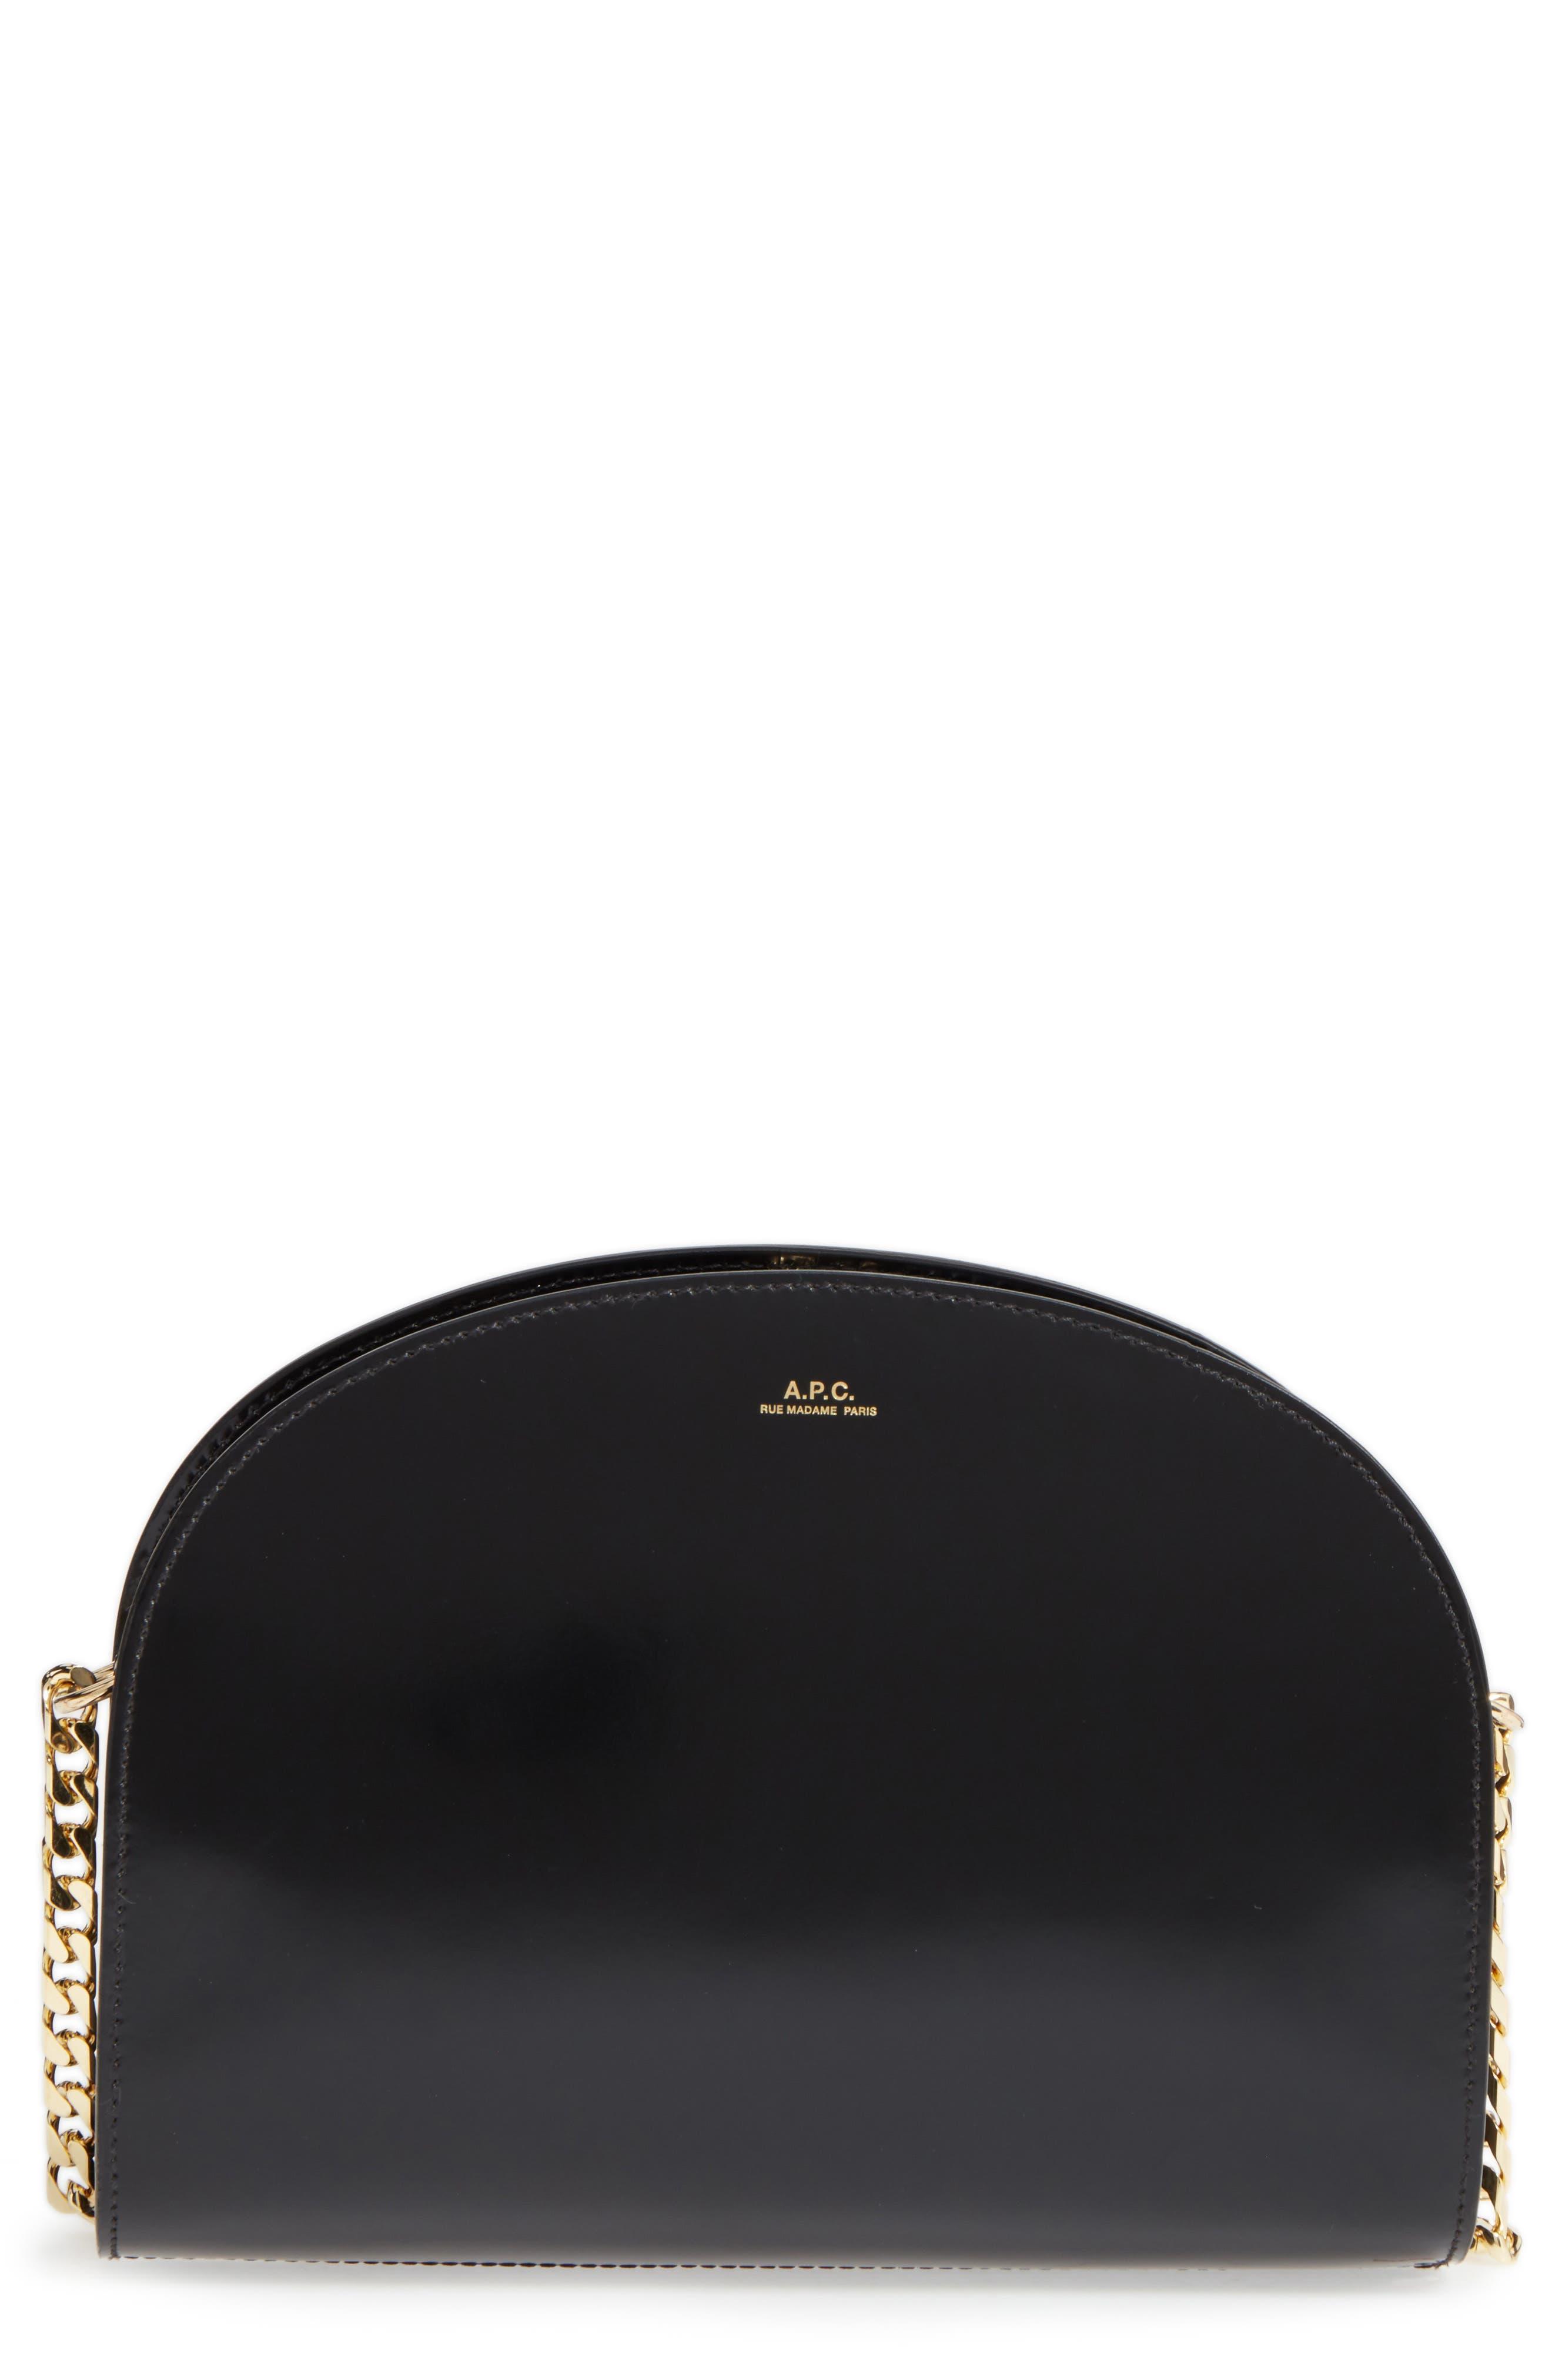 A.P.C. Sac Luna Leather Shoulder Bag